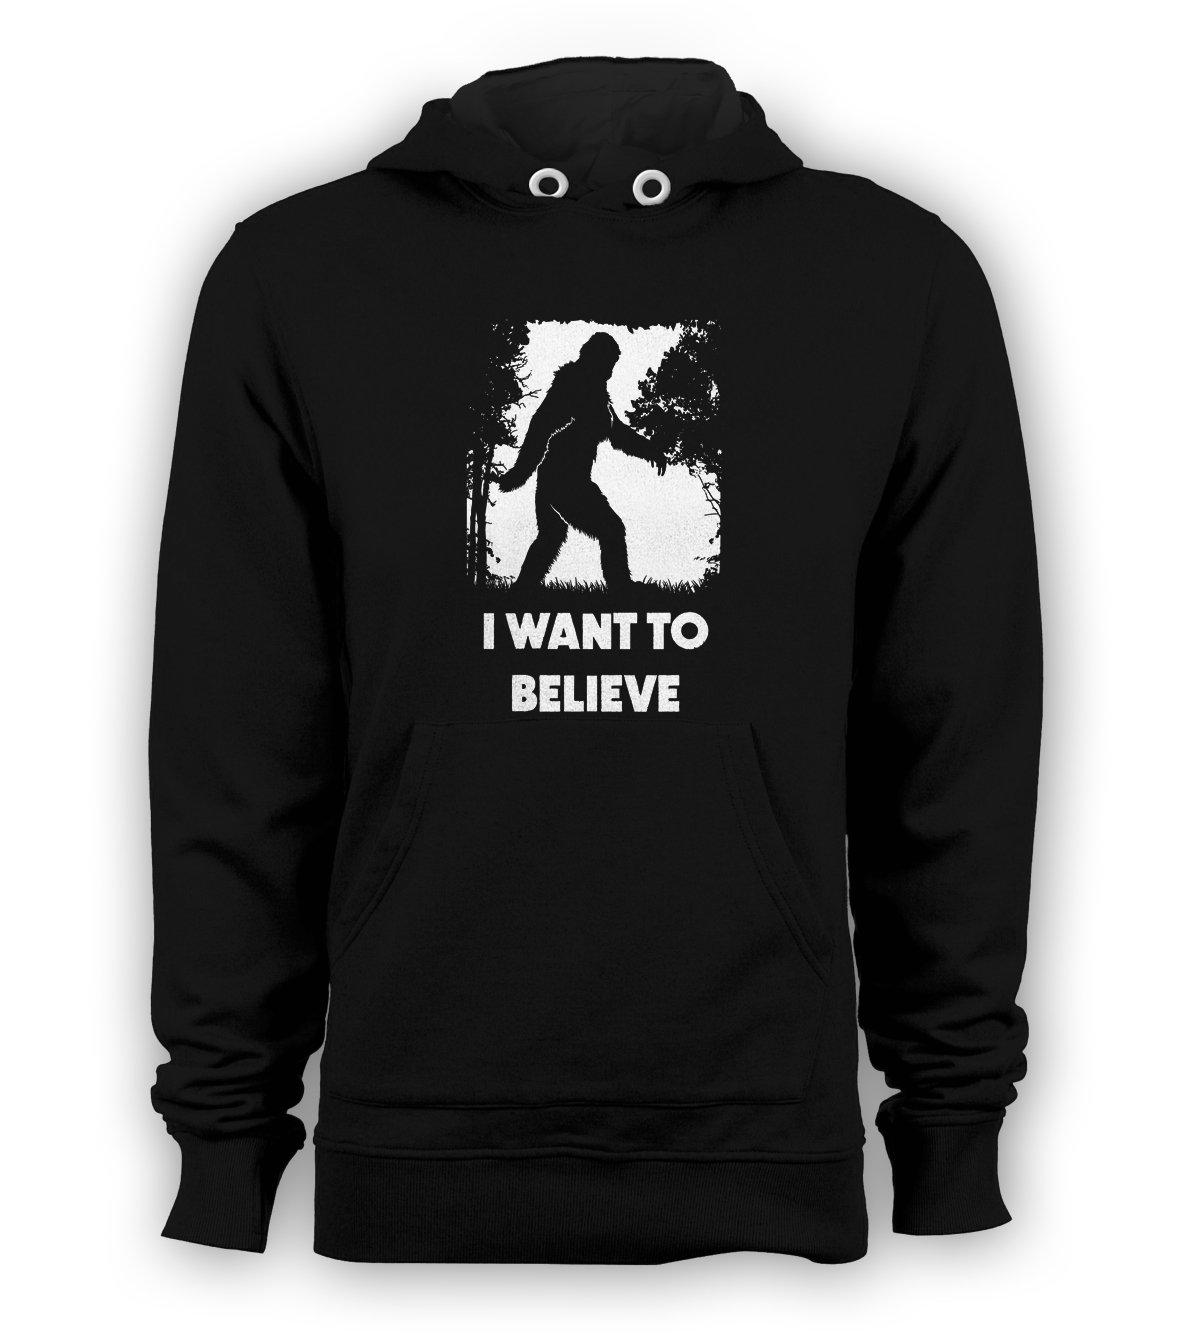 Bigfoot Sasquatch I Want To Believe Men's Pullover Hoodie Sweatshirts Black New